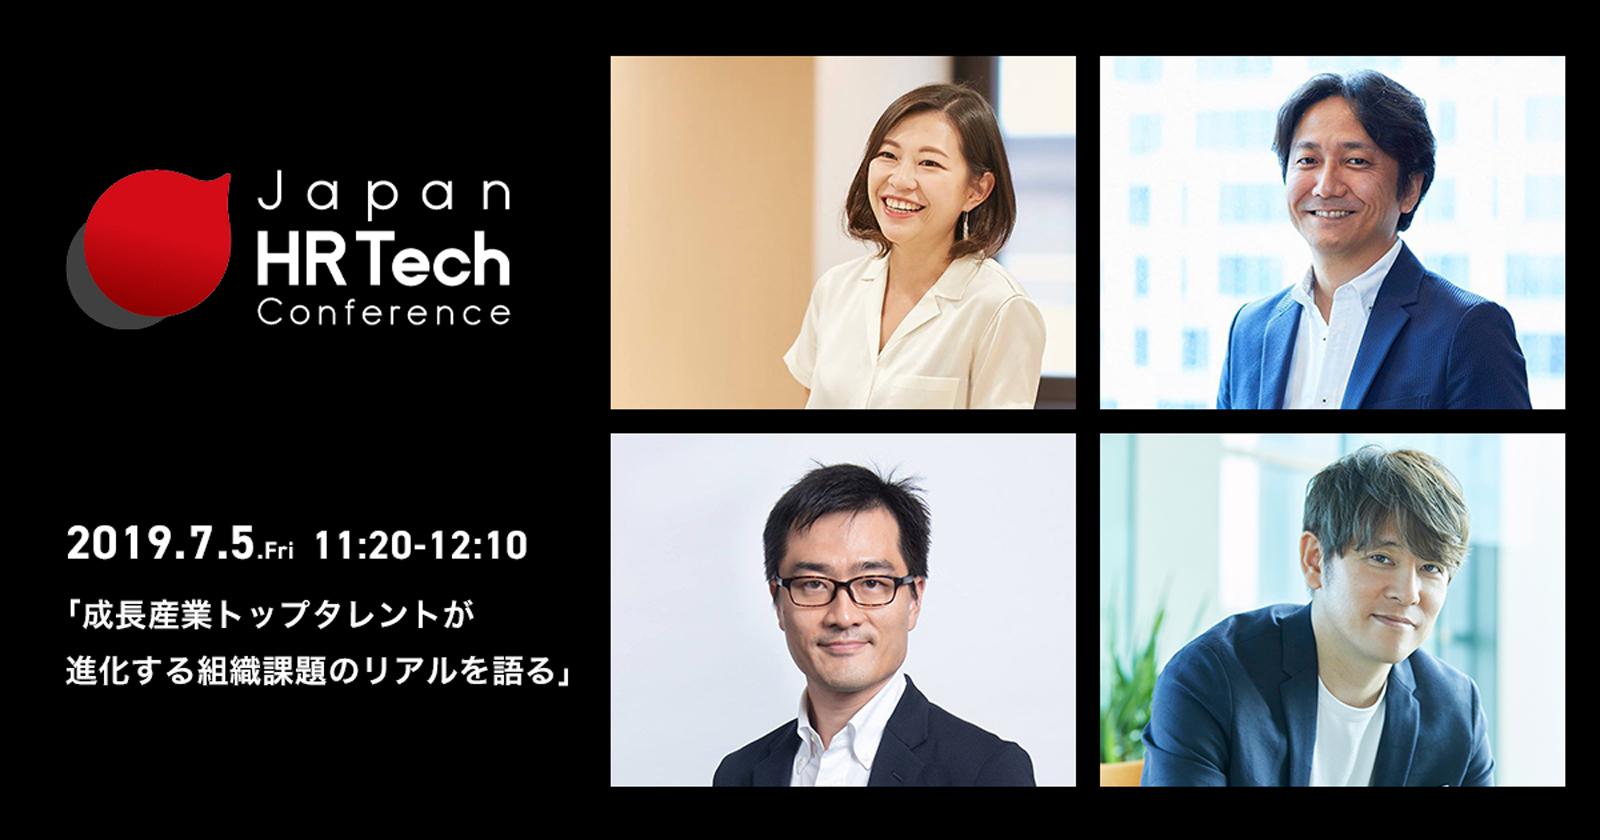 Japan HR Tech Conference 2019「成長産業トップタレントが進化する組織課題のリアルを語る」登壇者決定!